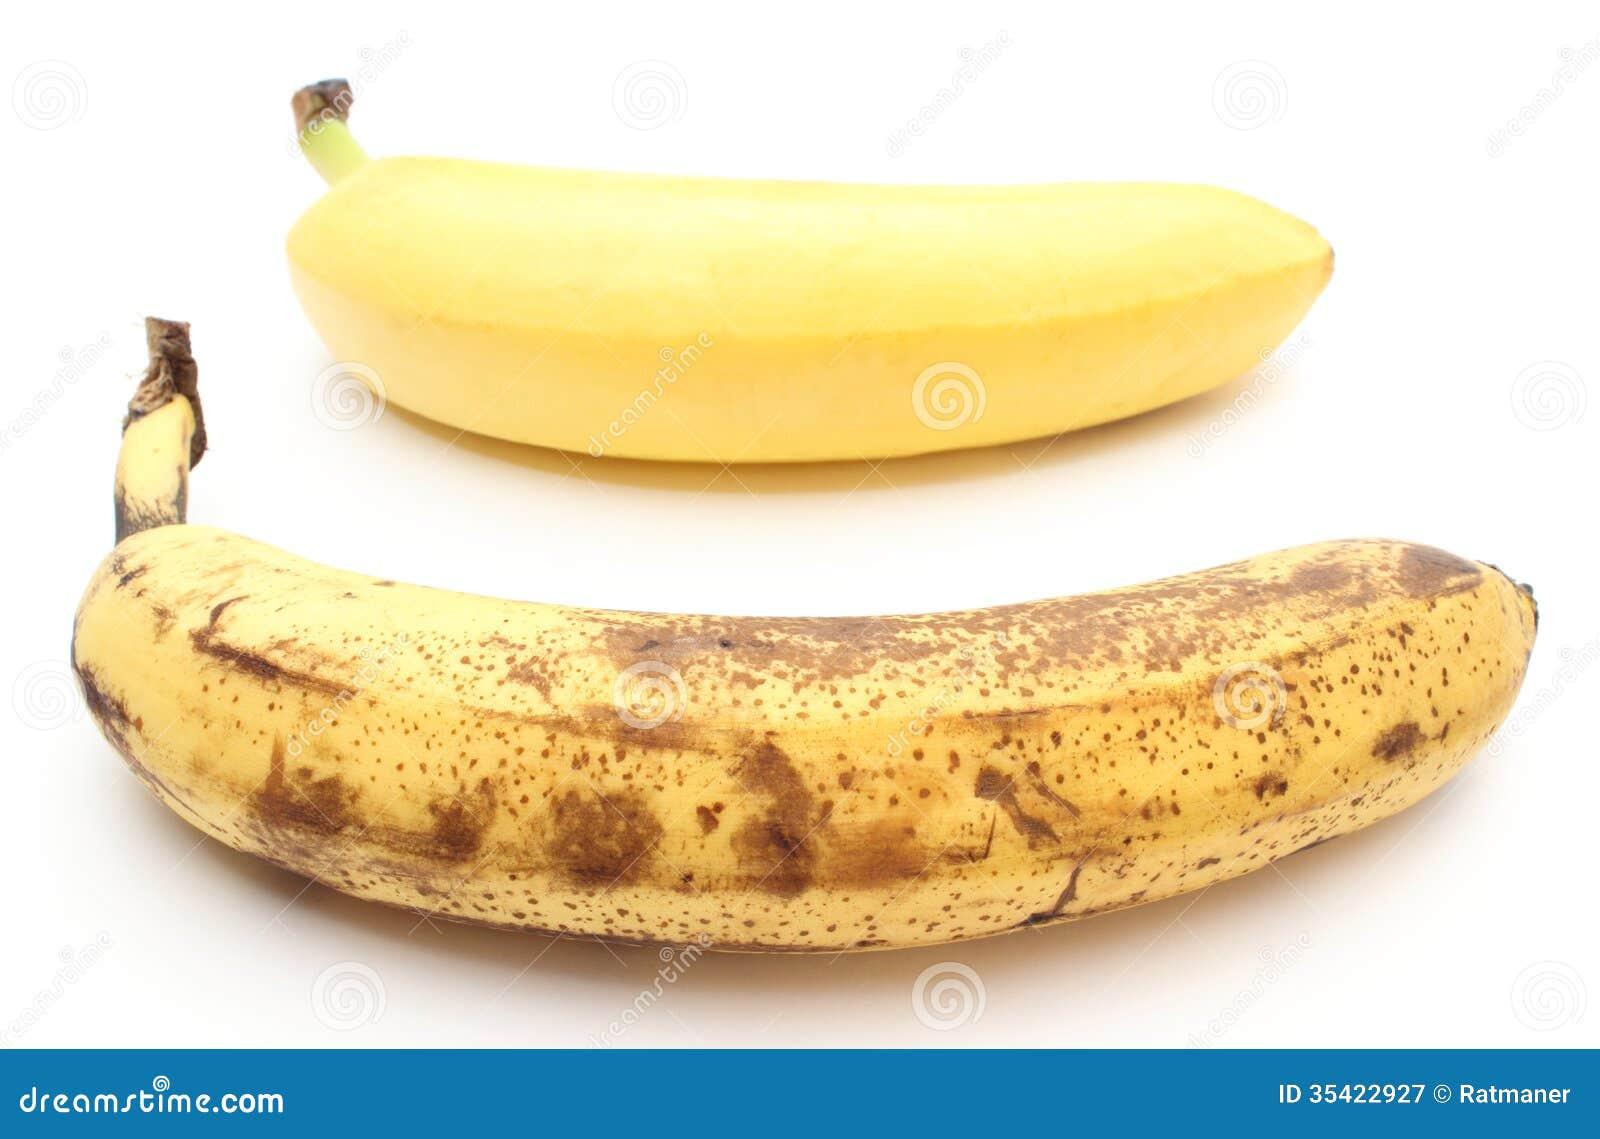 Two bananas up my fuck holes 8